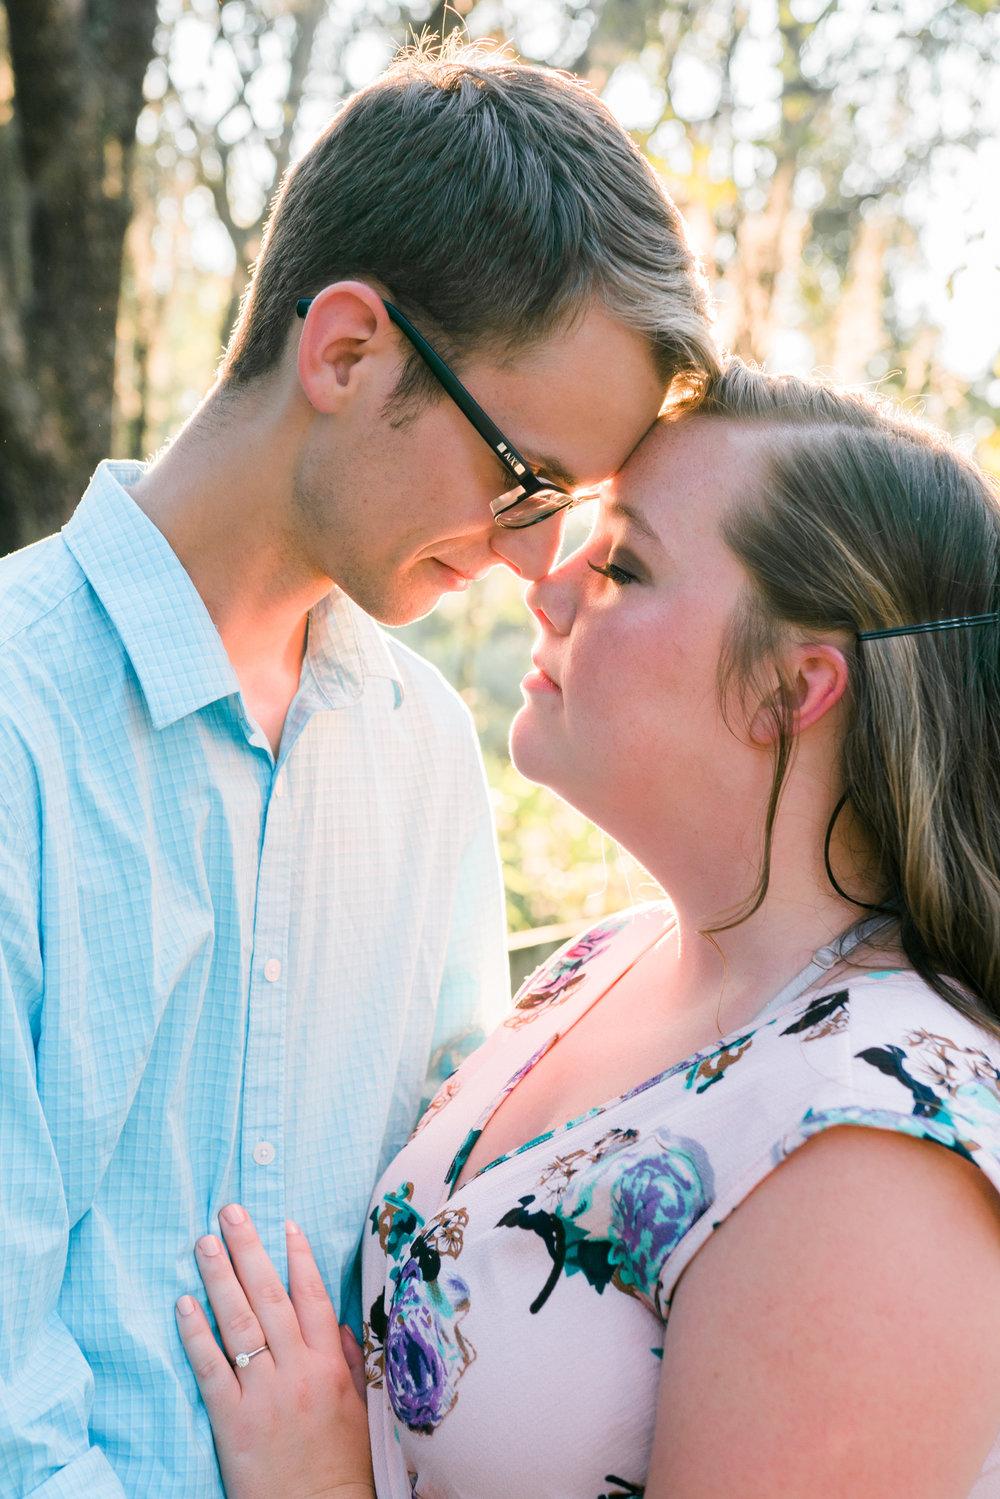 Tampa-couples-photo, Tampa-photographer